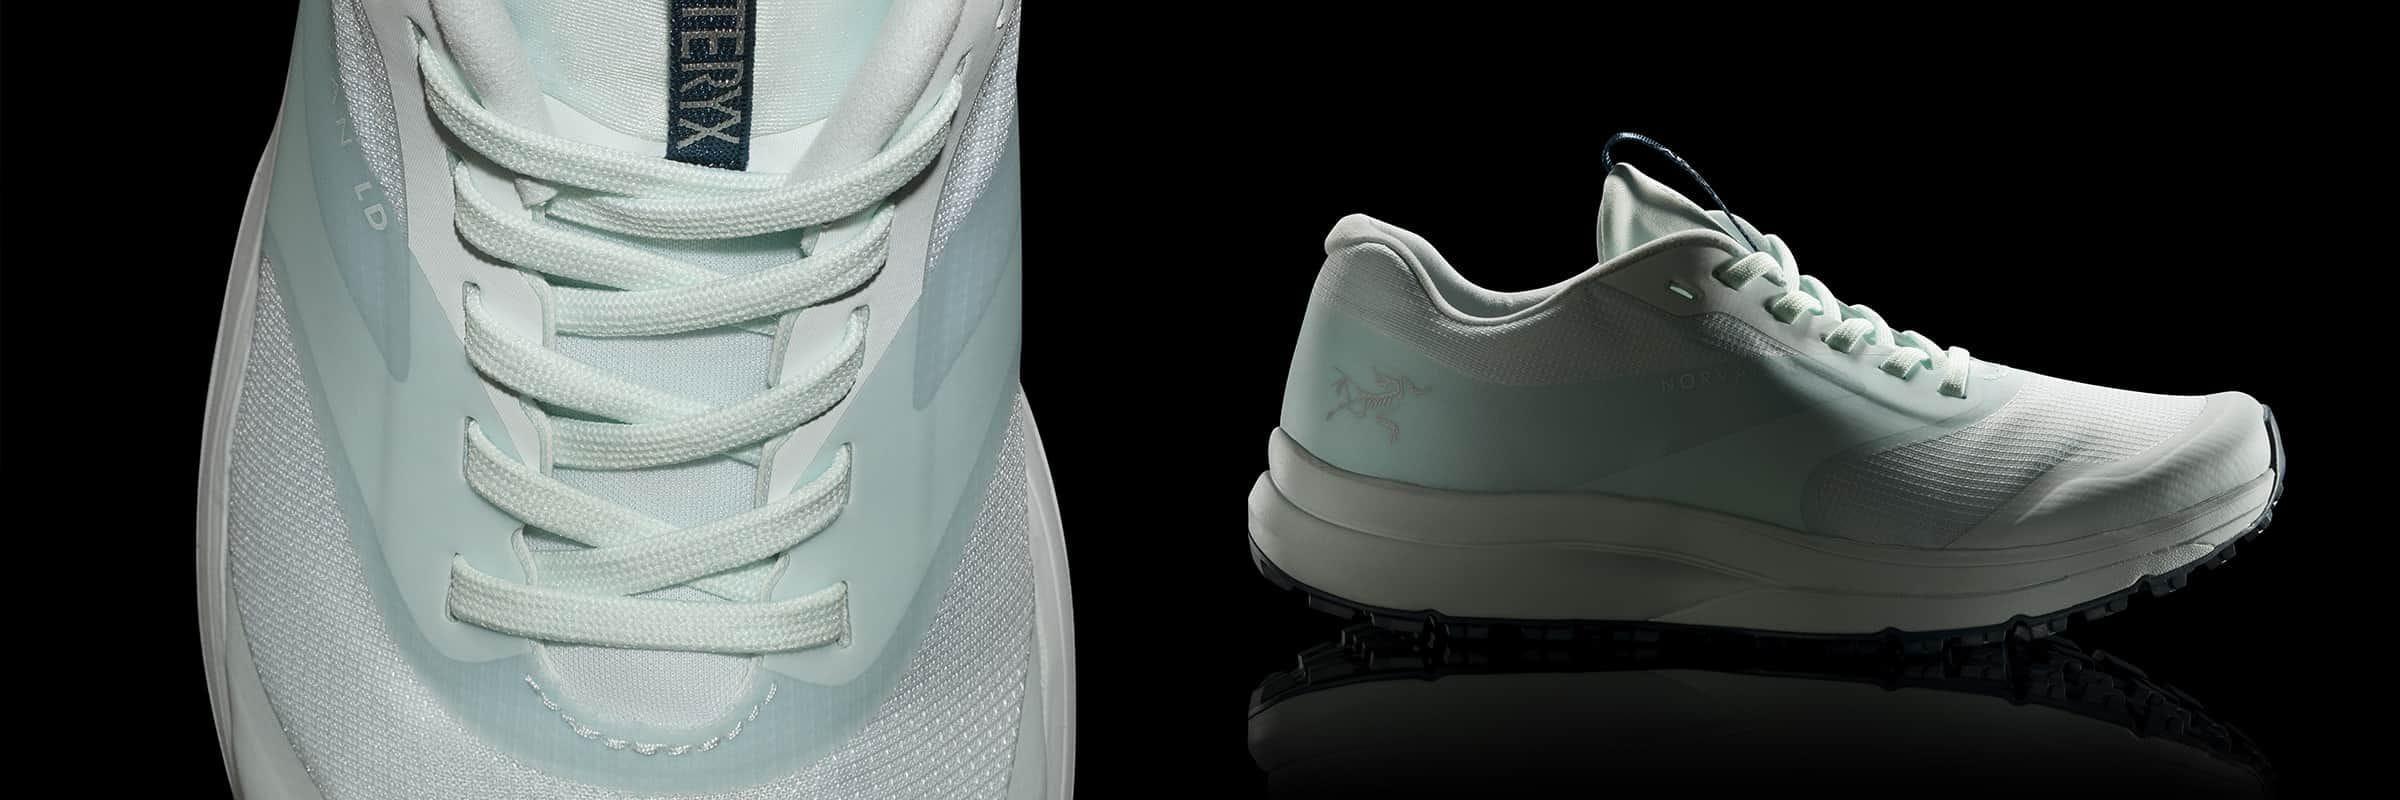 arcteryx norvan ld trial running shoe